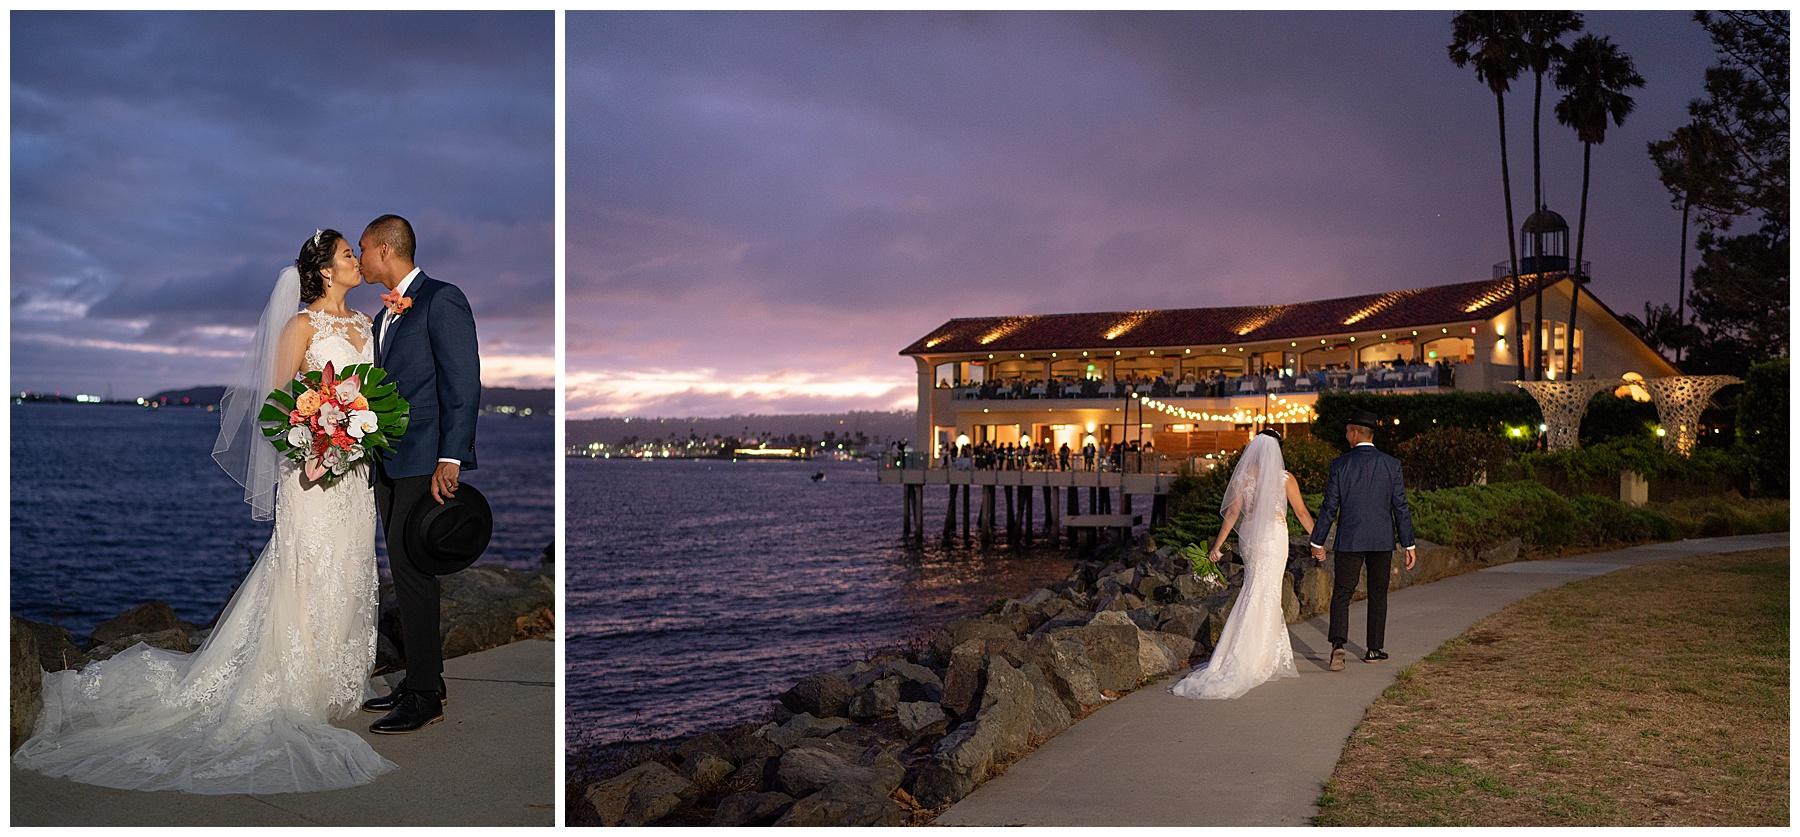 tom ham's lighthouse wedding sunset